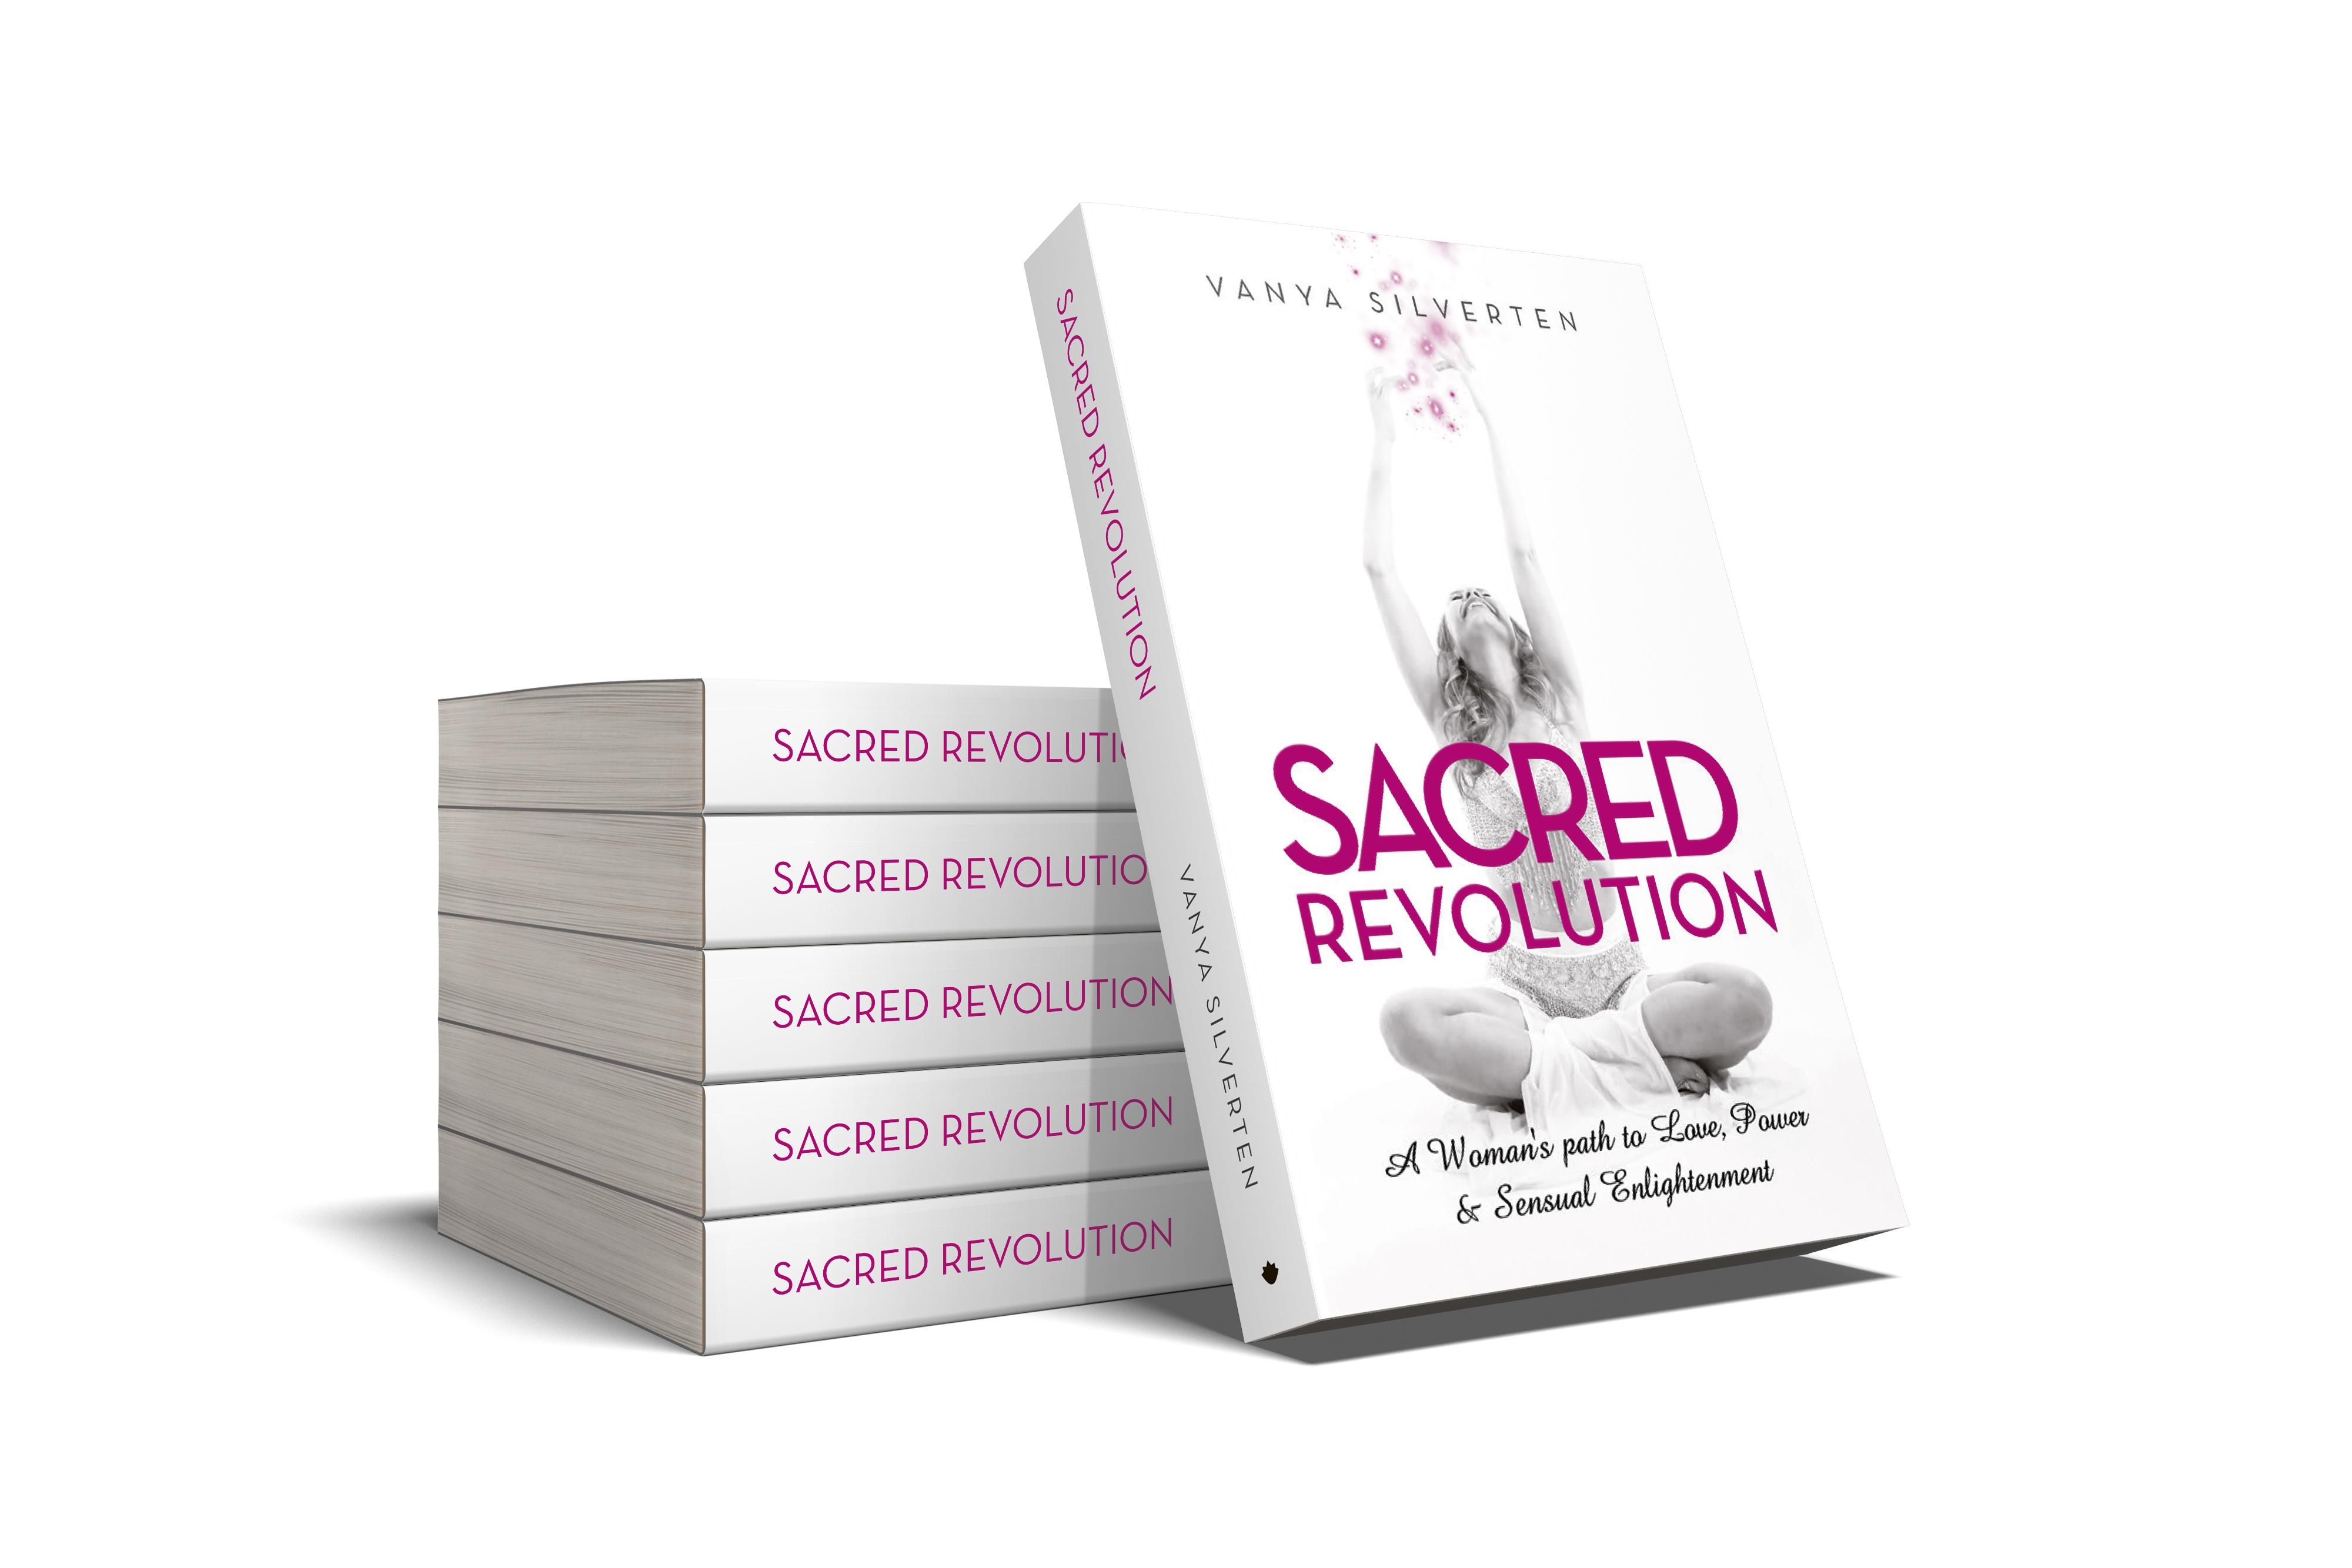 Sacred Revolution book